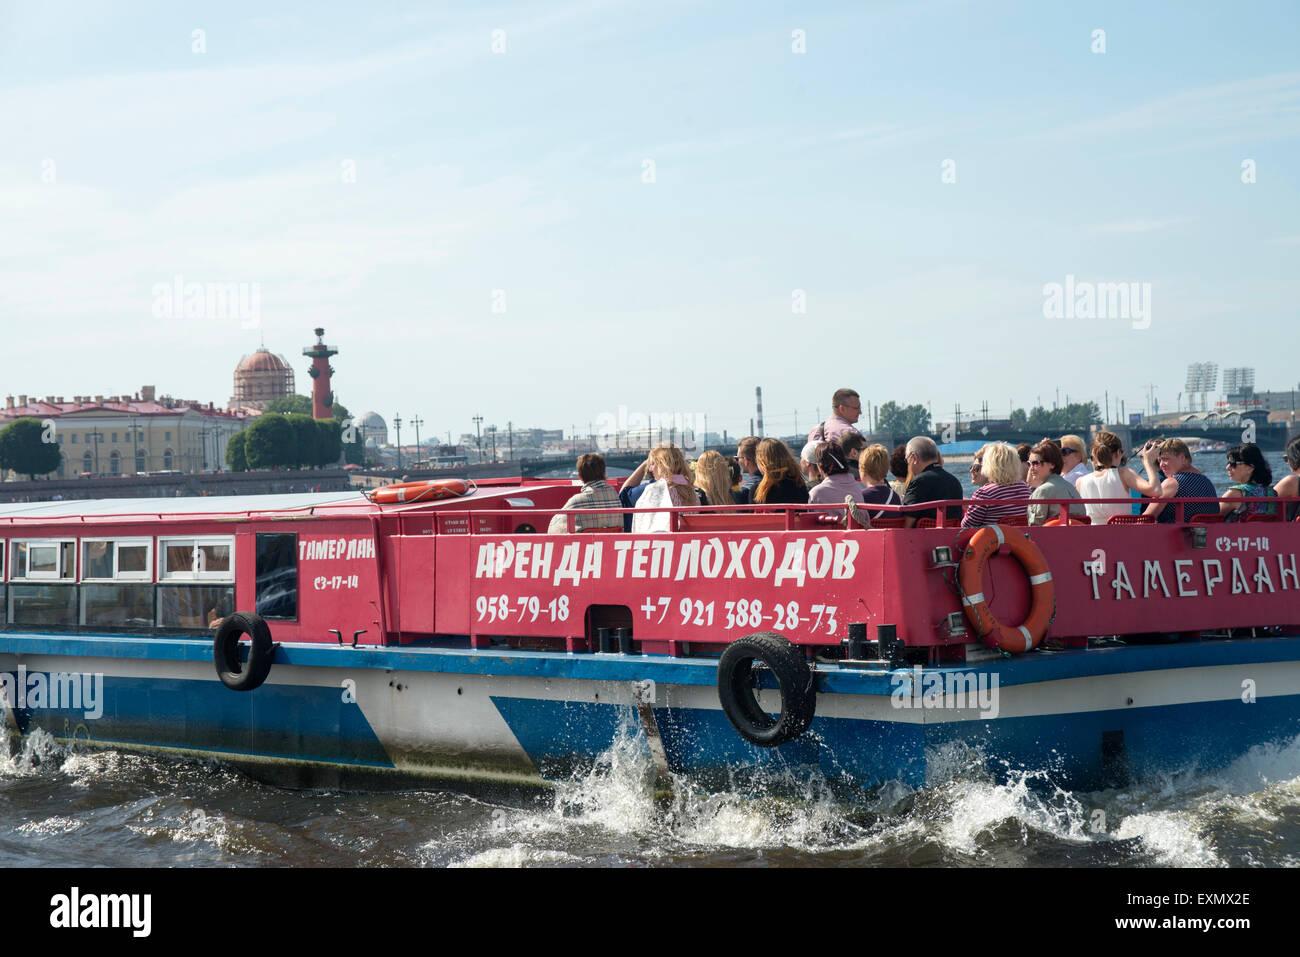 Tourist boat on the Neva river, St. Petersburg - Stock Image